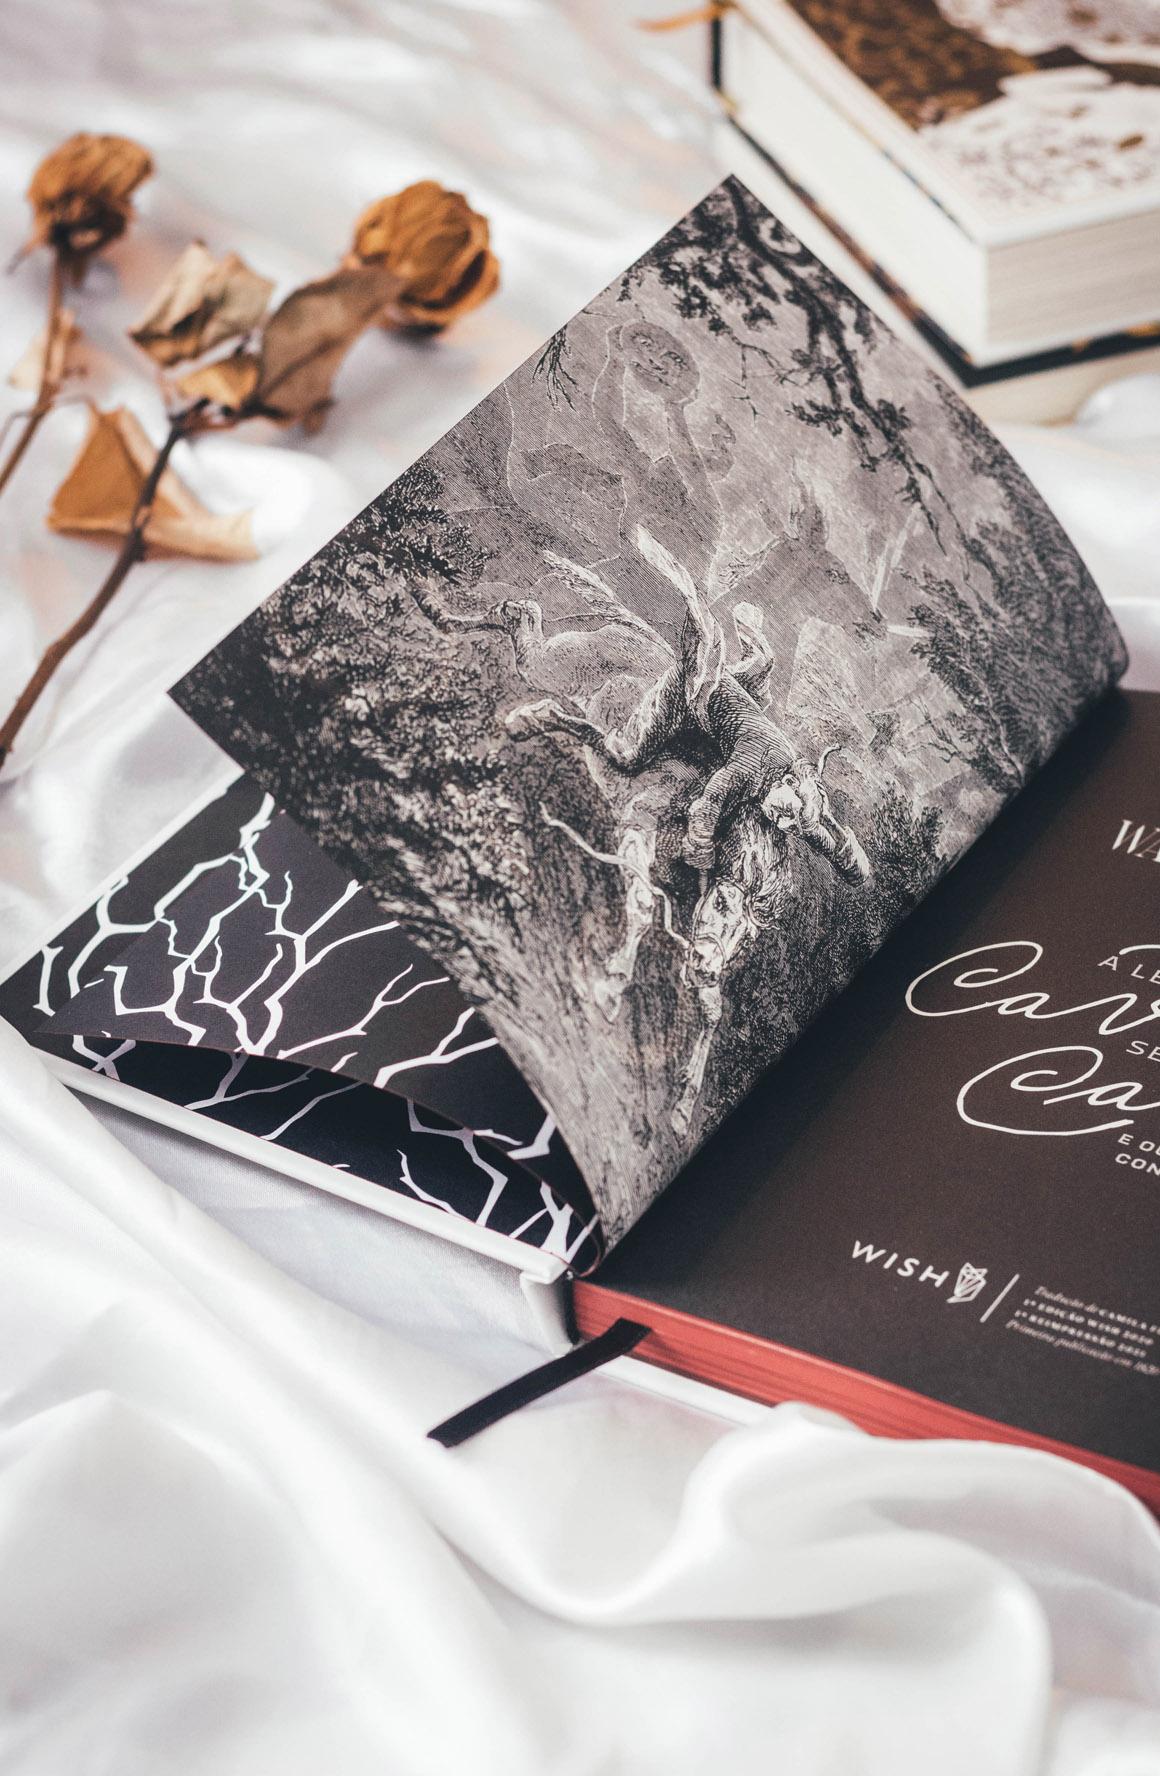 Sleepy Hollow Editora wish